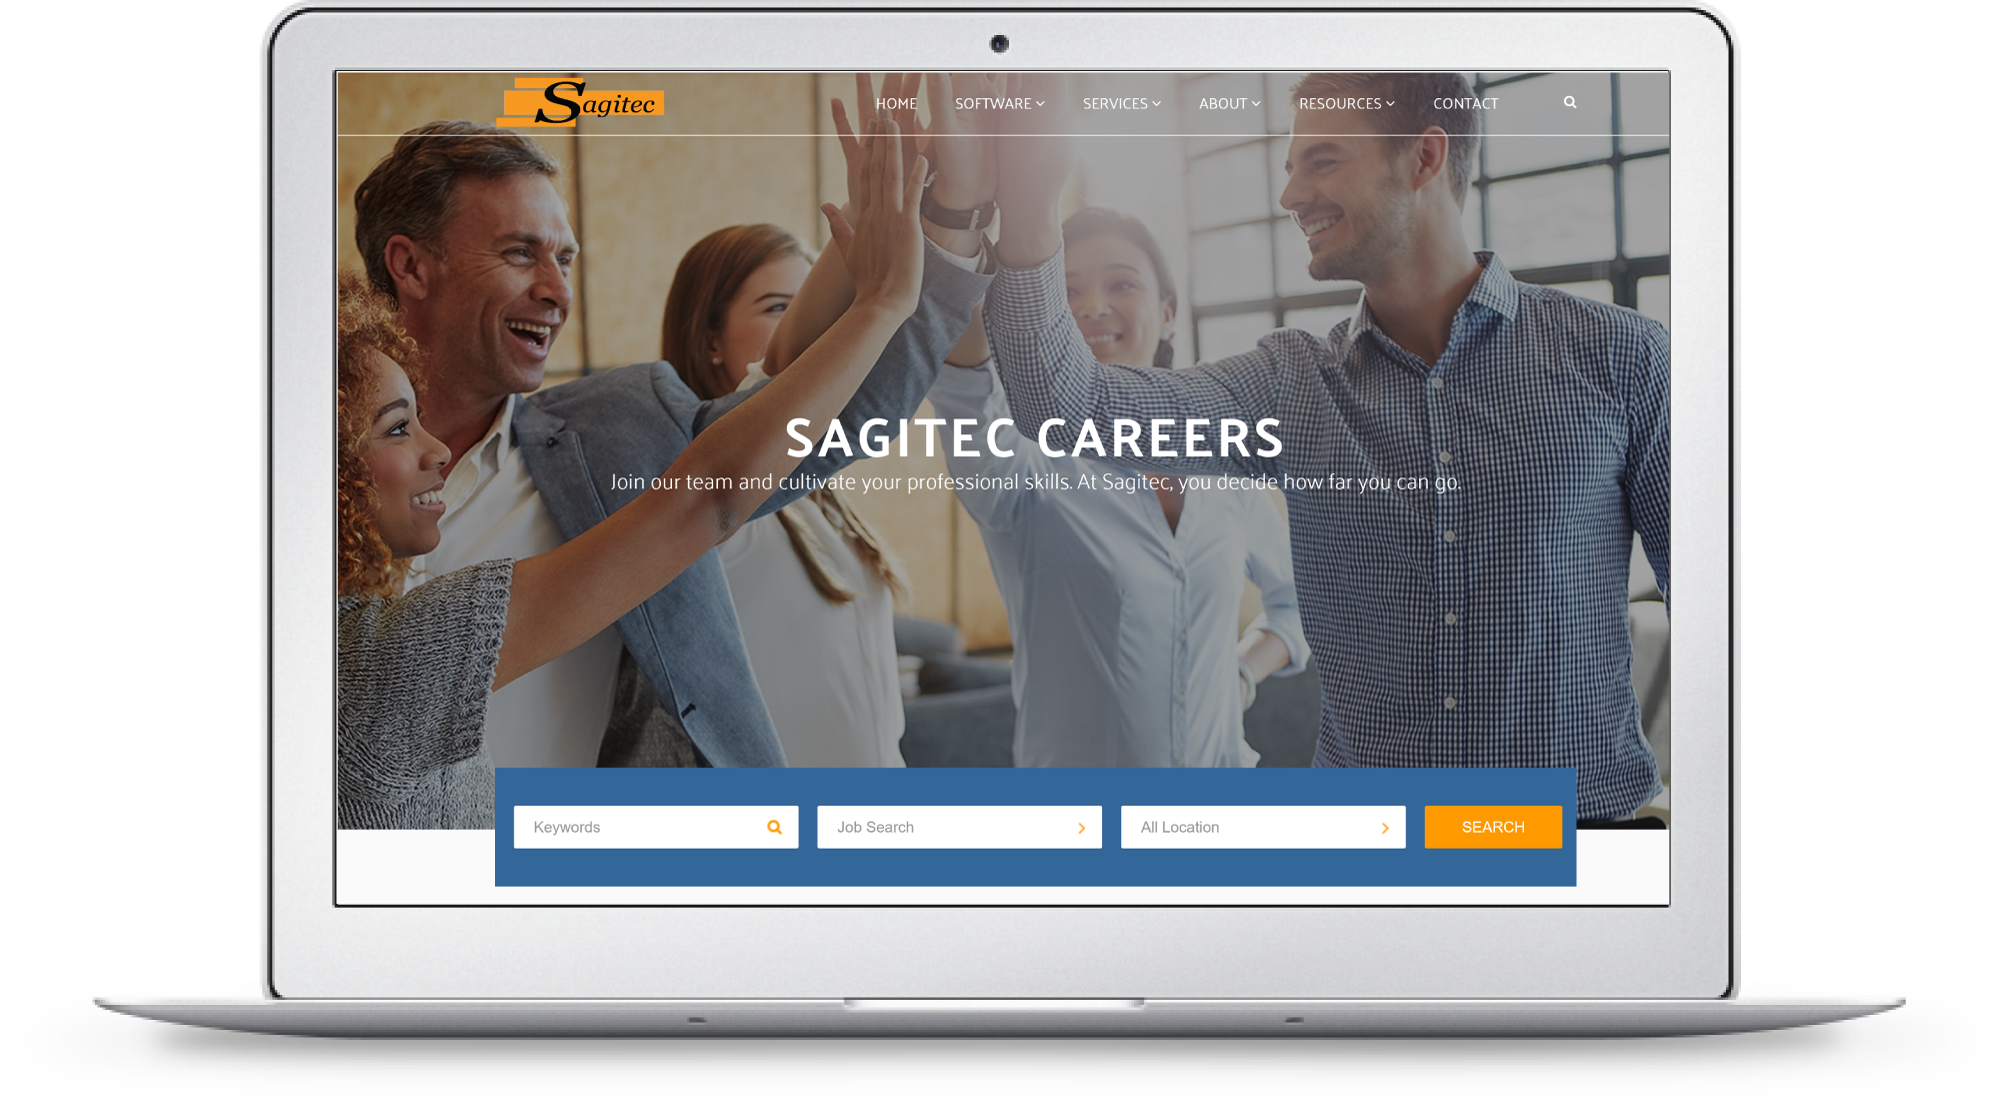 Computer-Sagitec-Careers.png